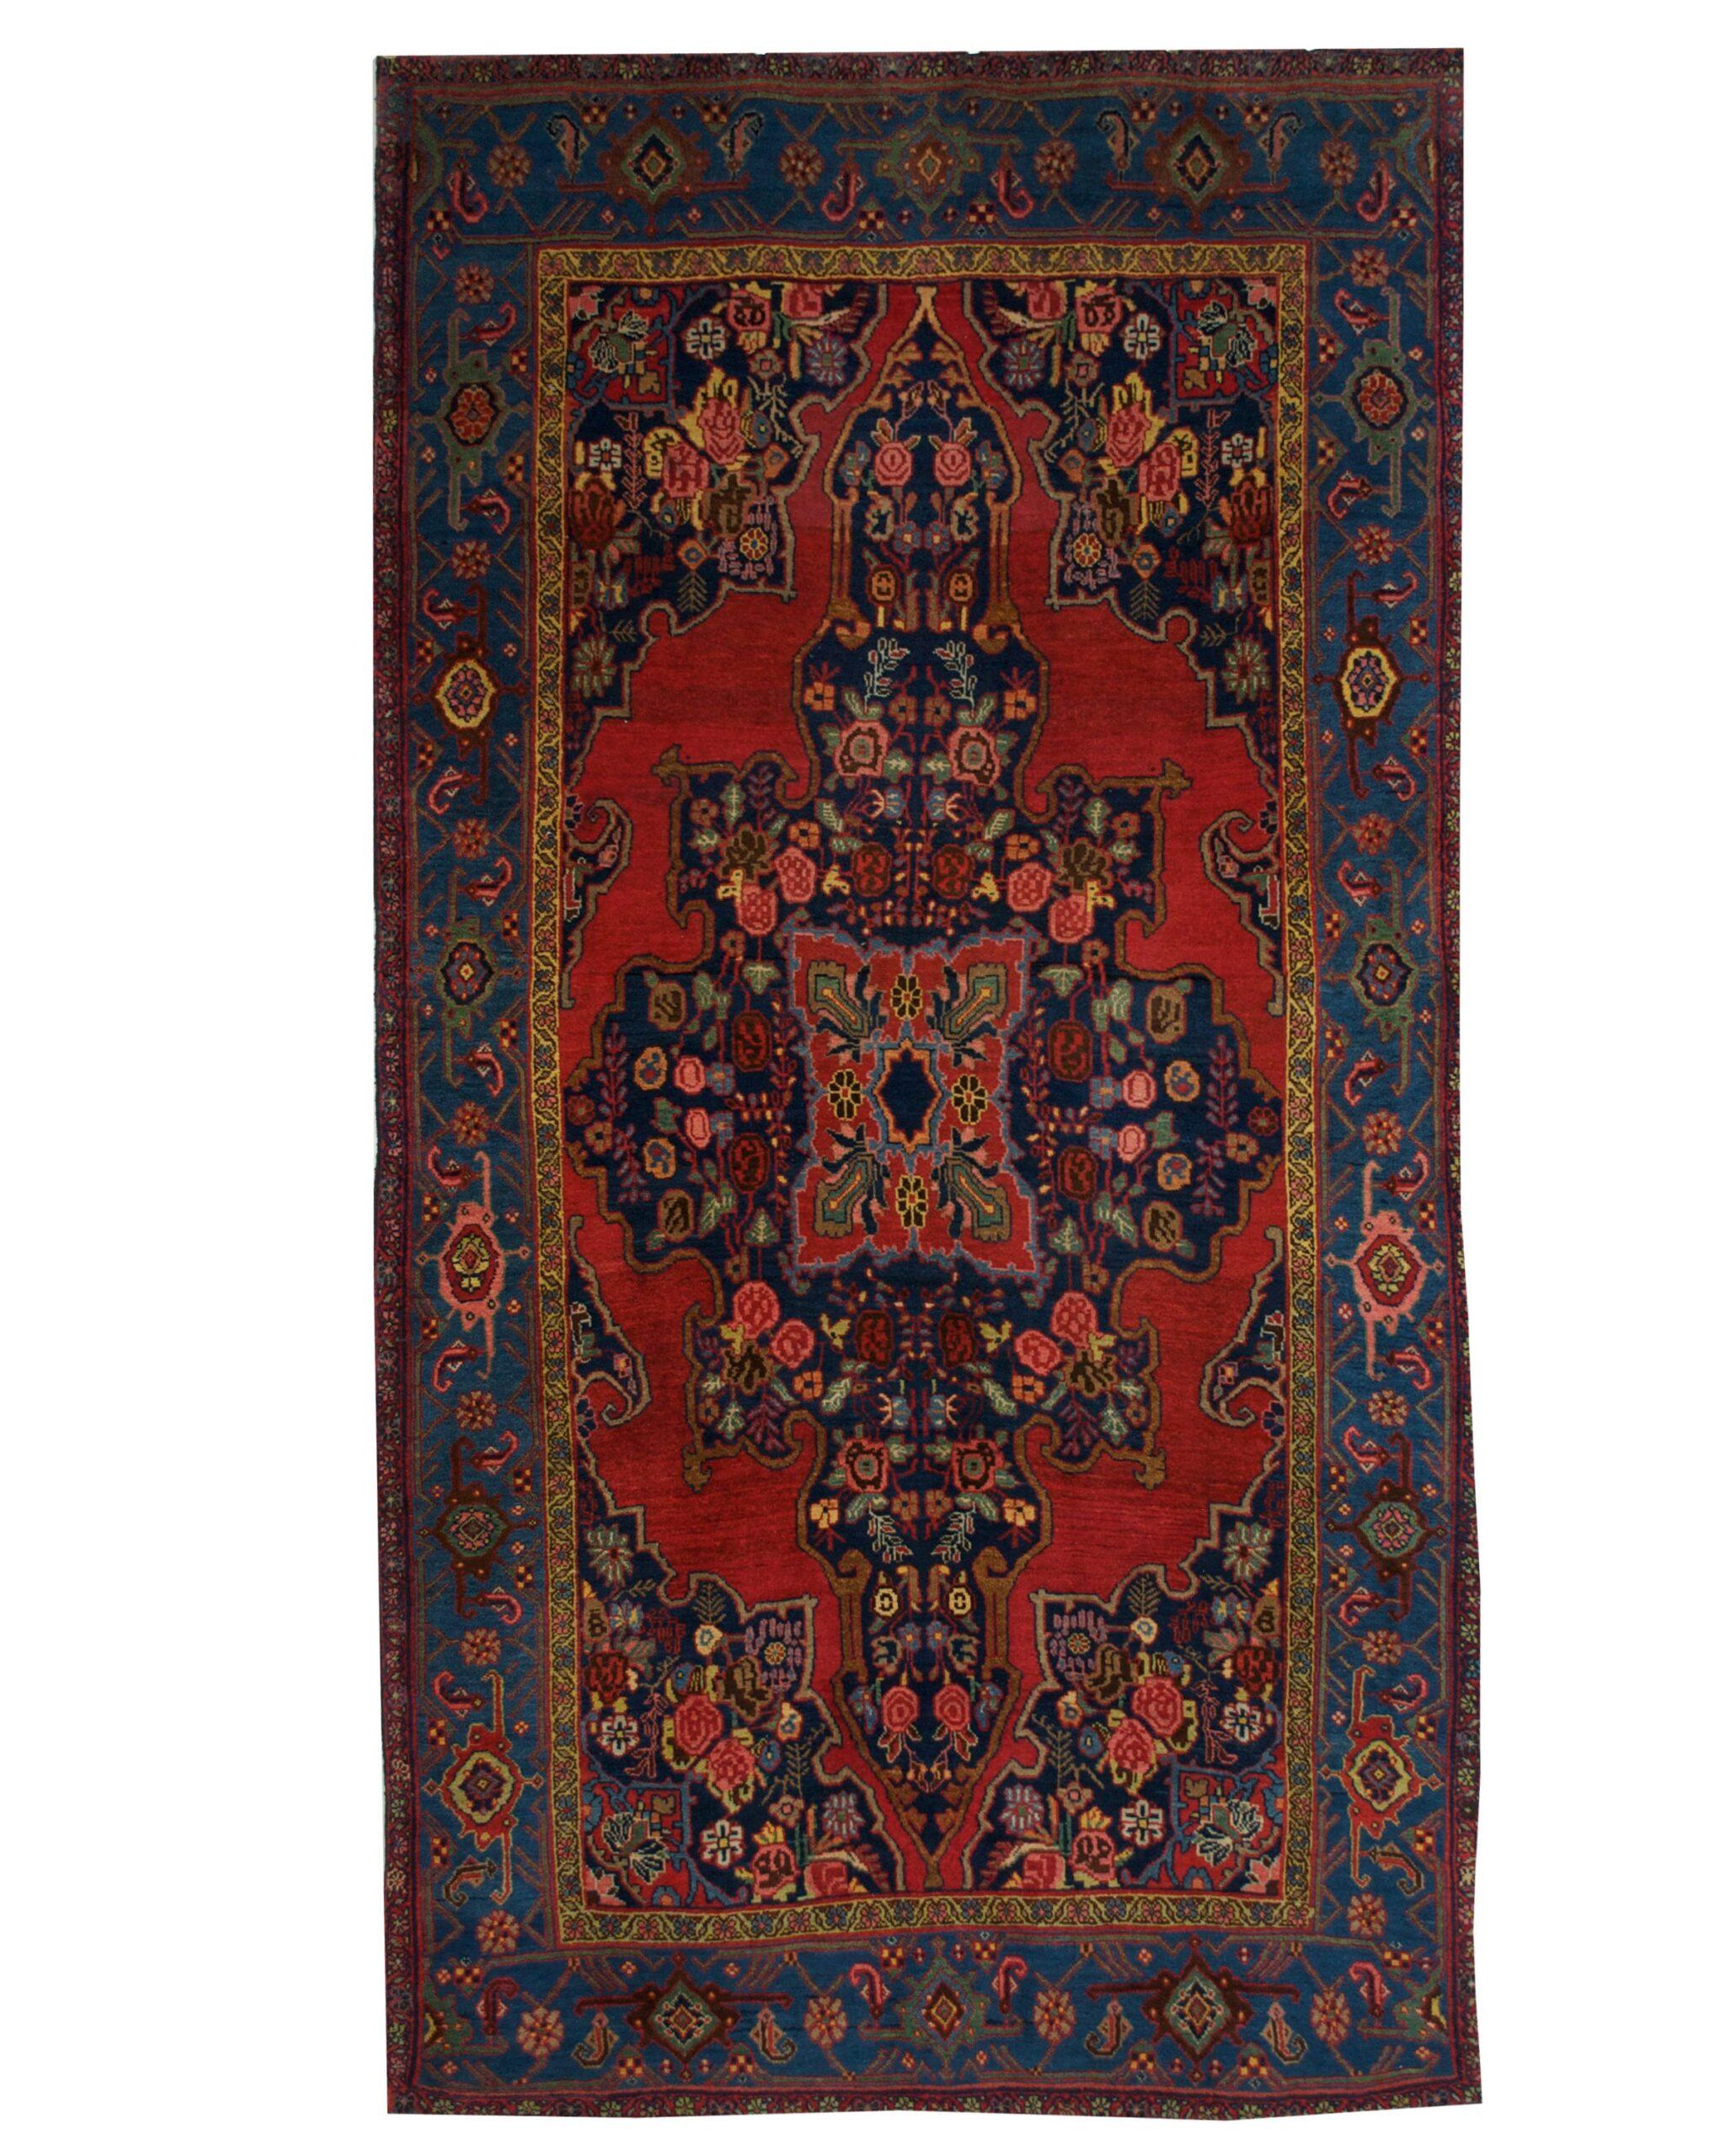 "Antique Persian Bijar 4' 10"" x 9' Handmade Wool Area Rug - Shabahang Royal Carpet"